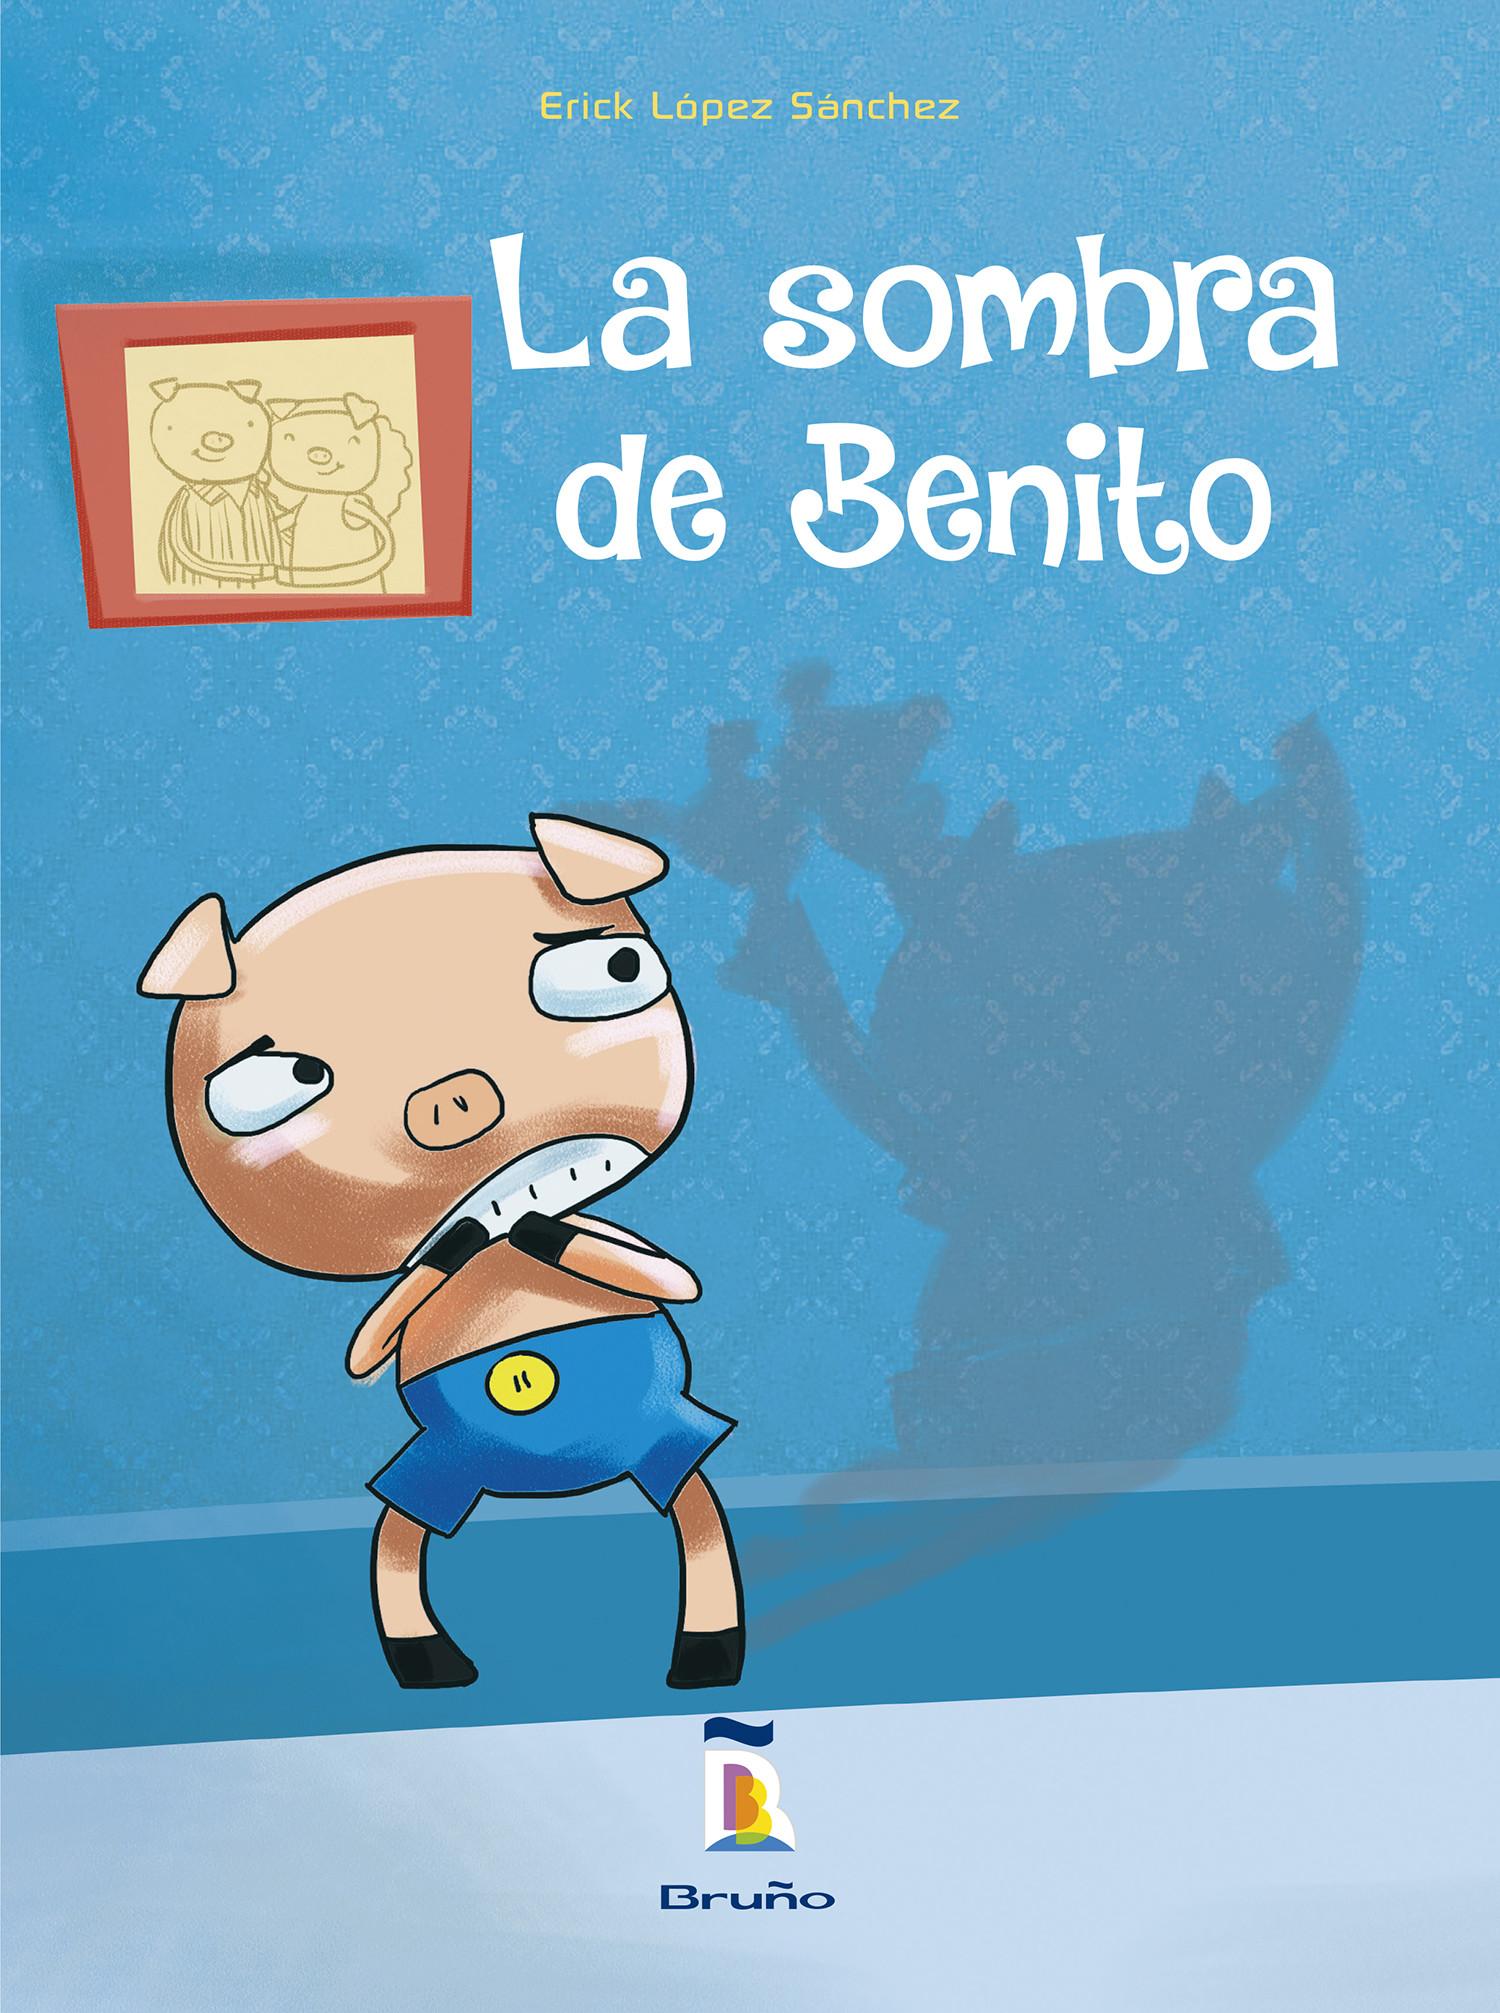 La sombra de Benito